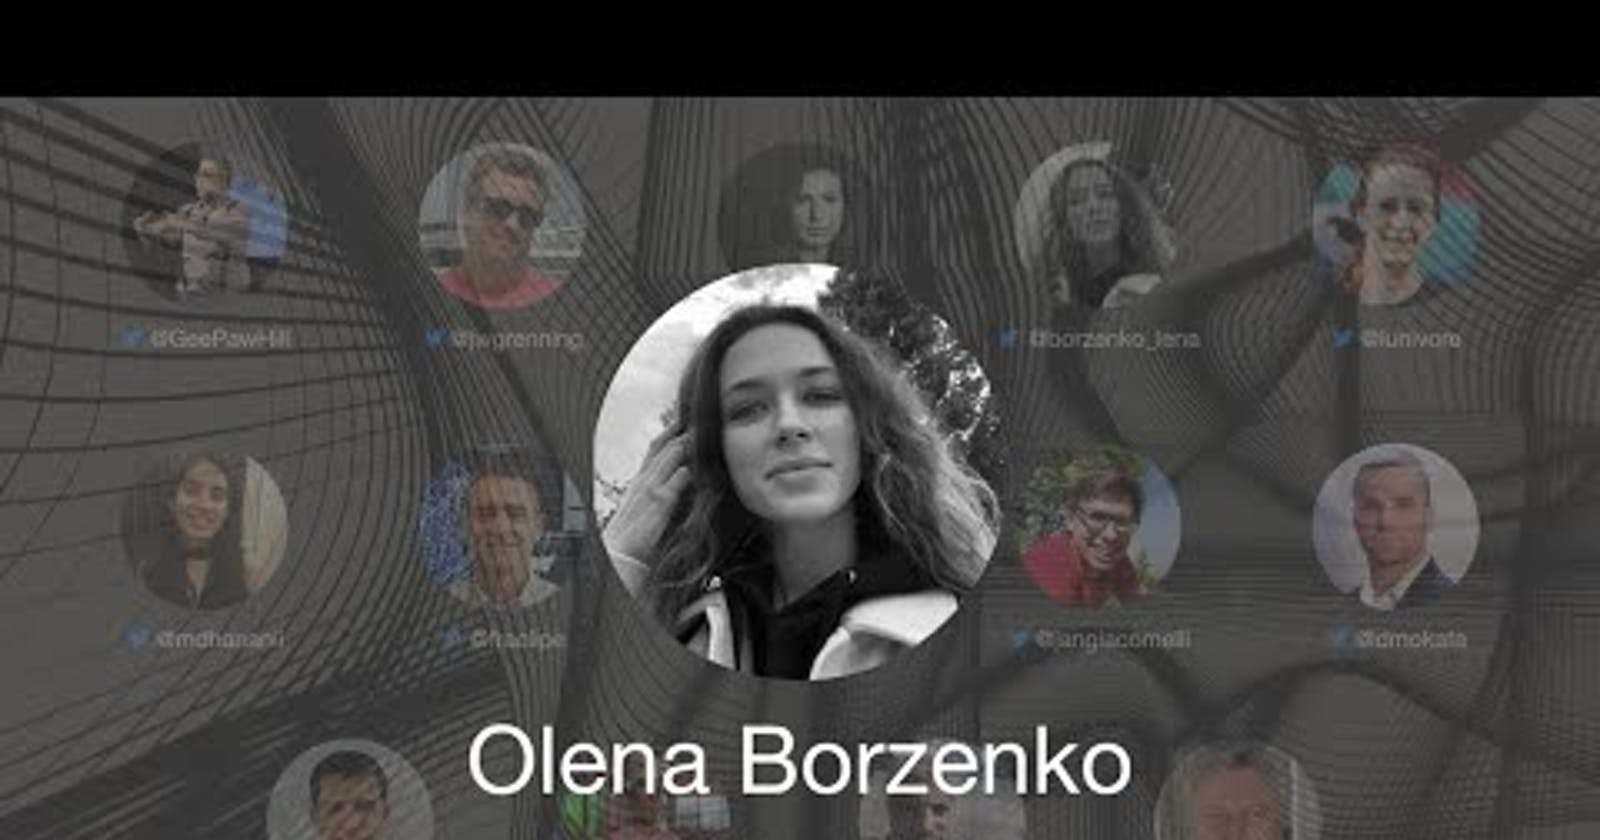 TDD Conference 2021 -  TDD Misconceptions - Olena Borzenko